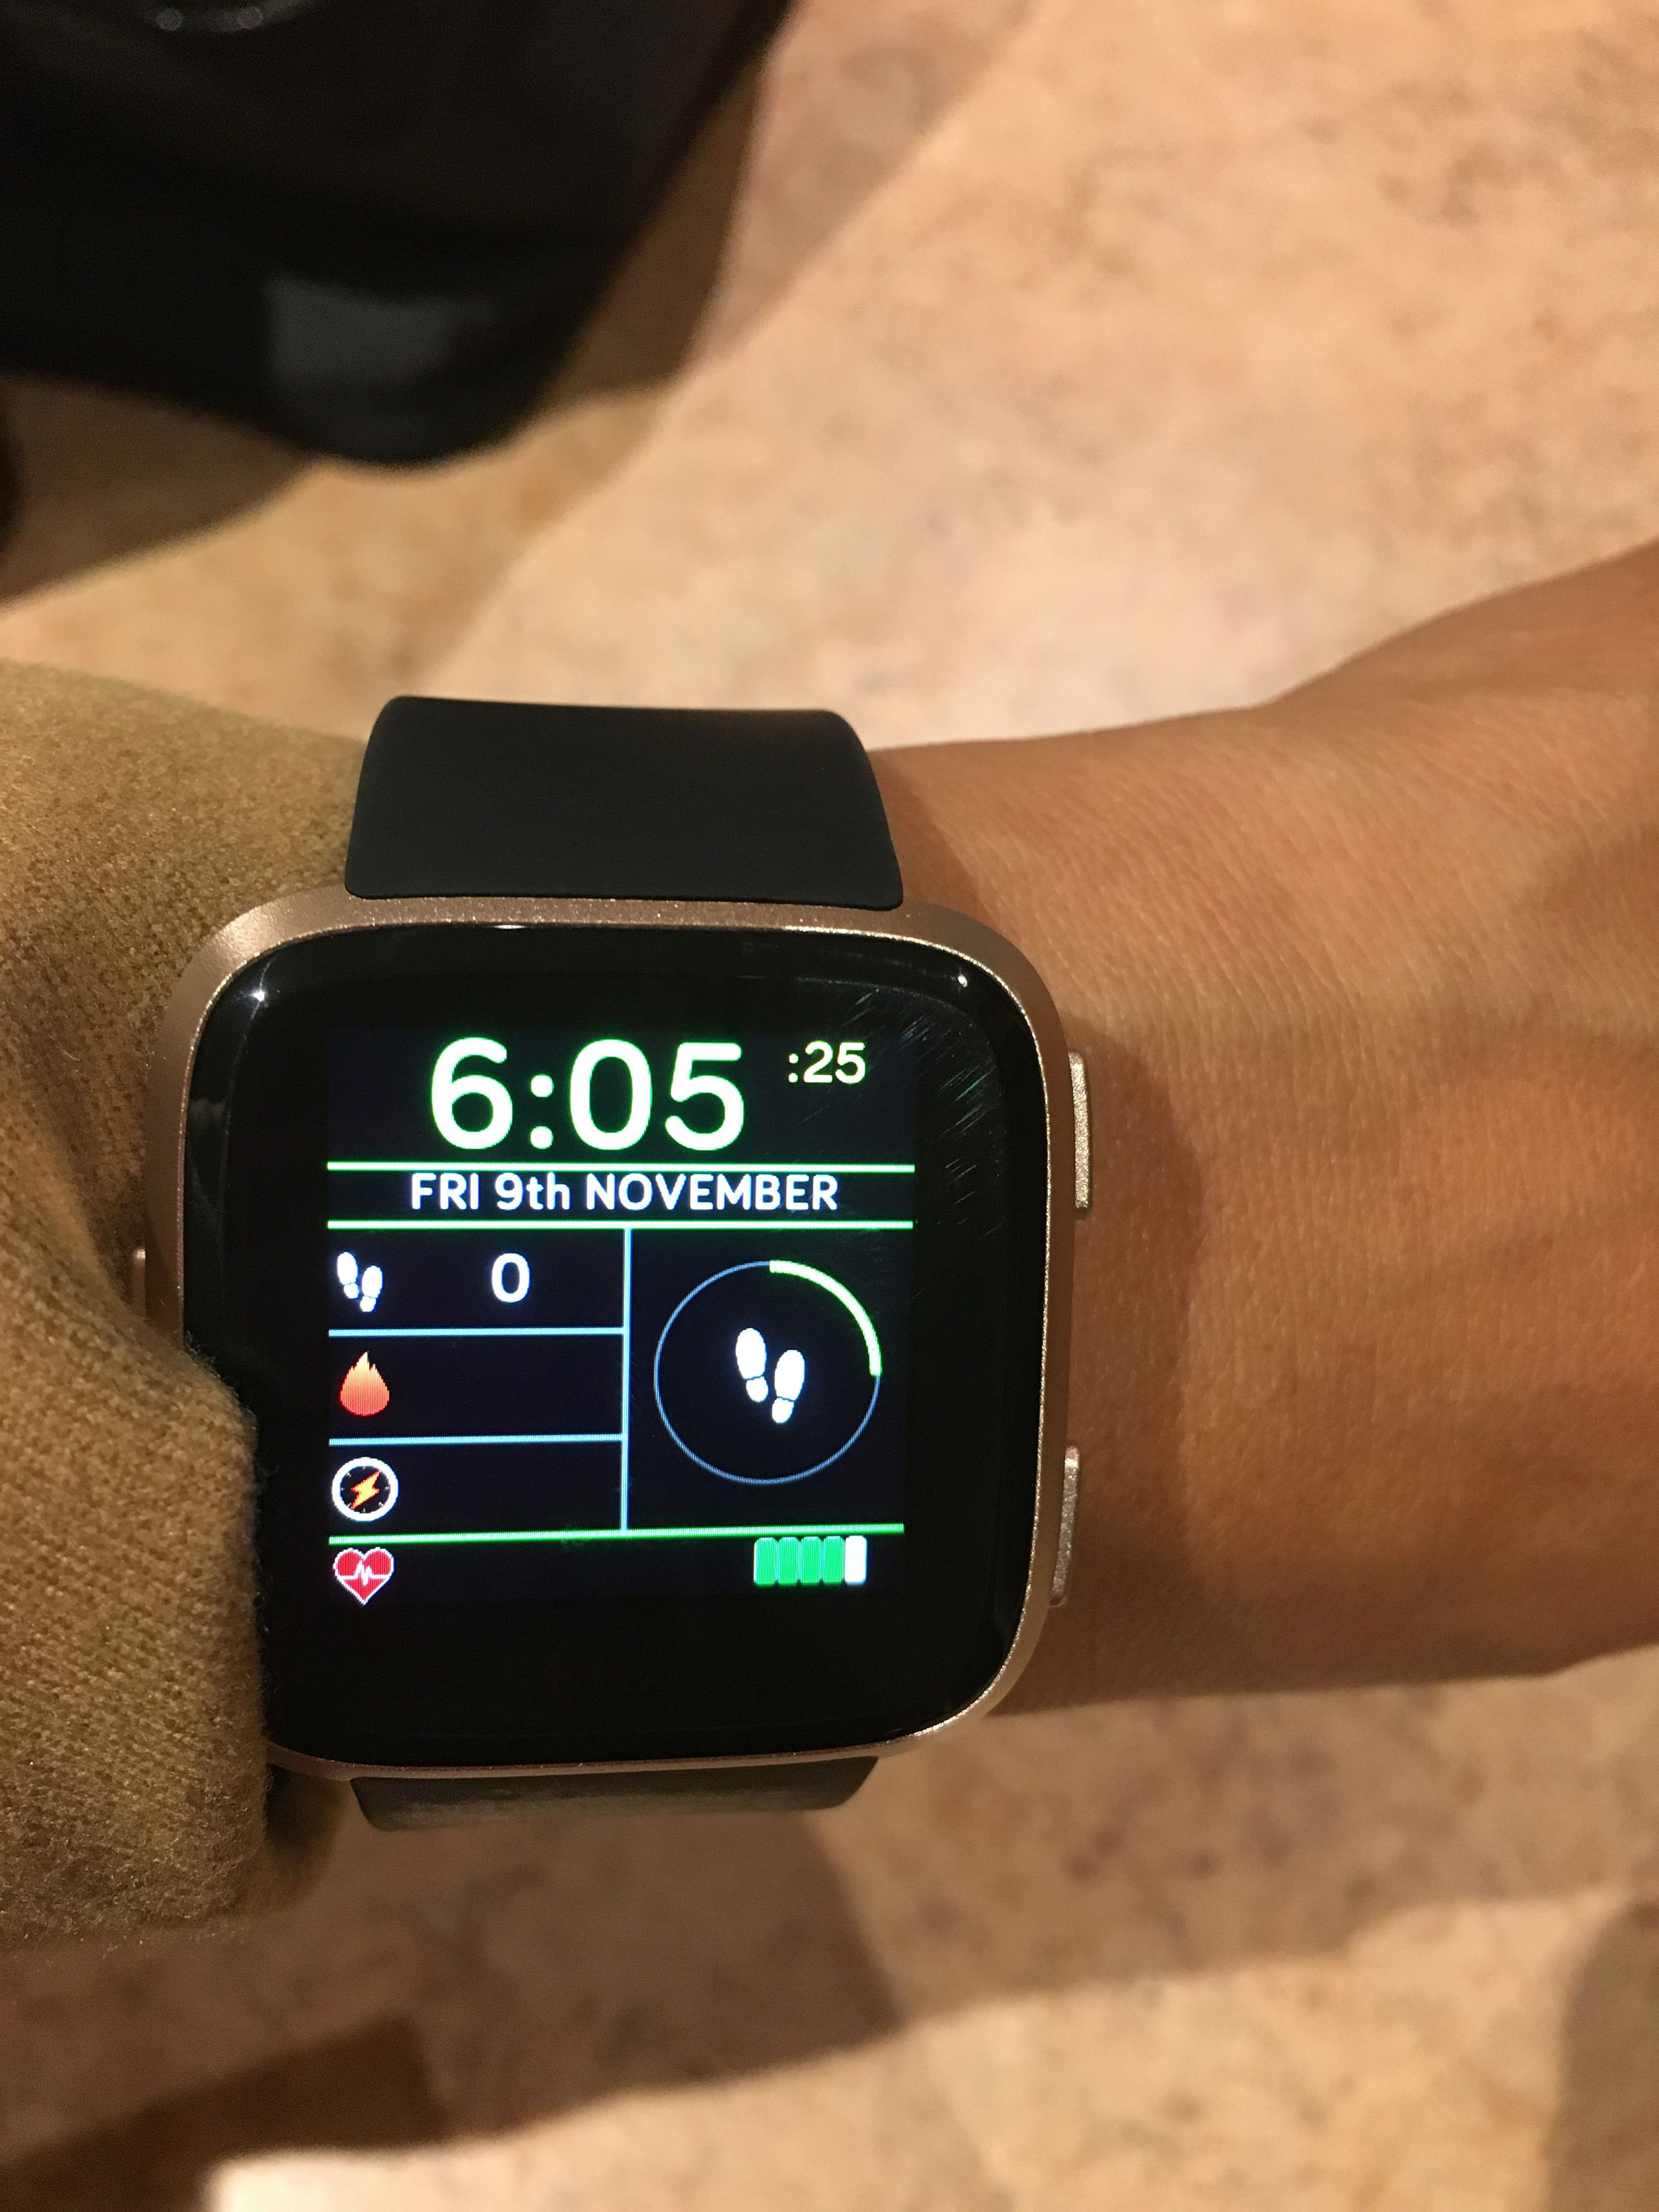 Fitbit OS 2 2 - Versa Firmware Release (32 12 19) - Fitbit